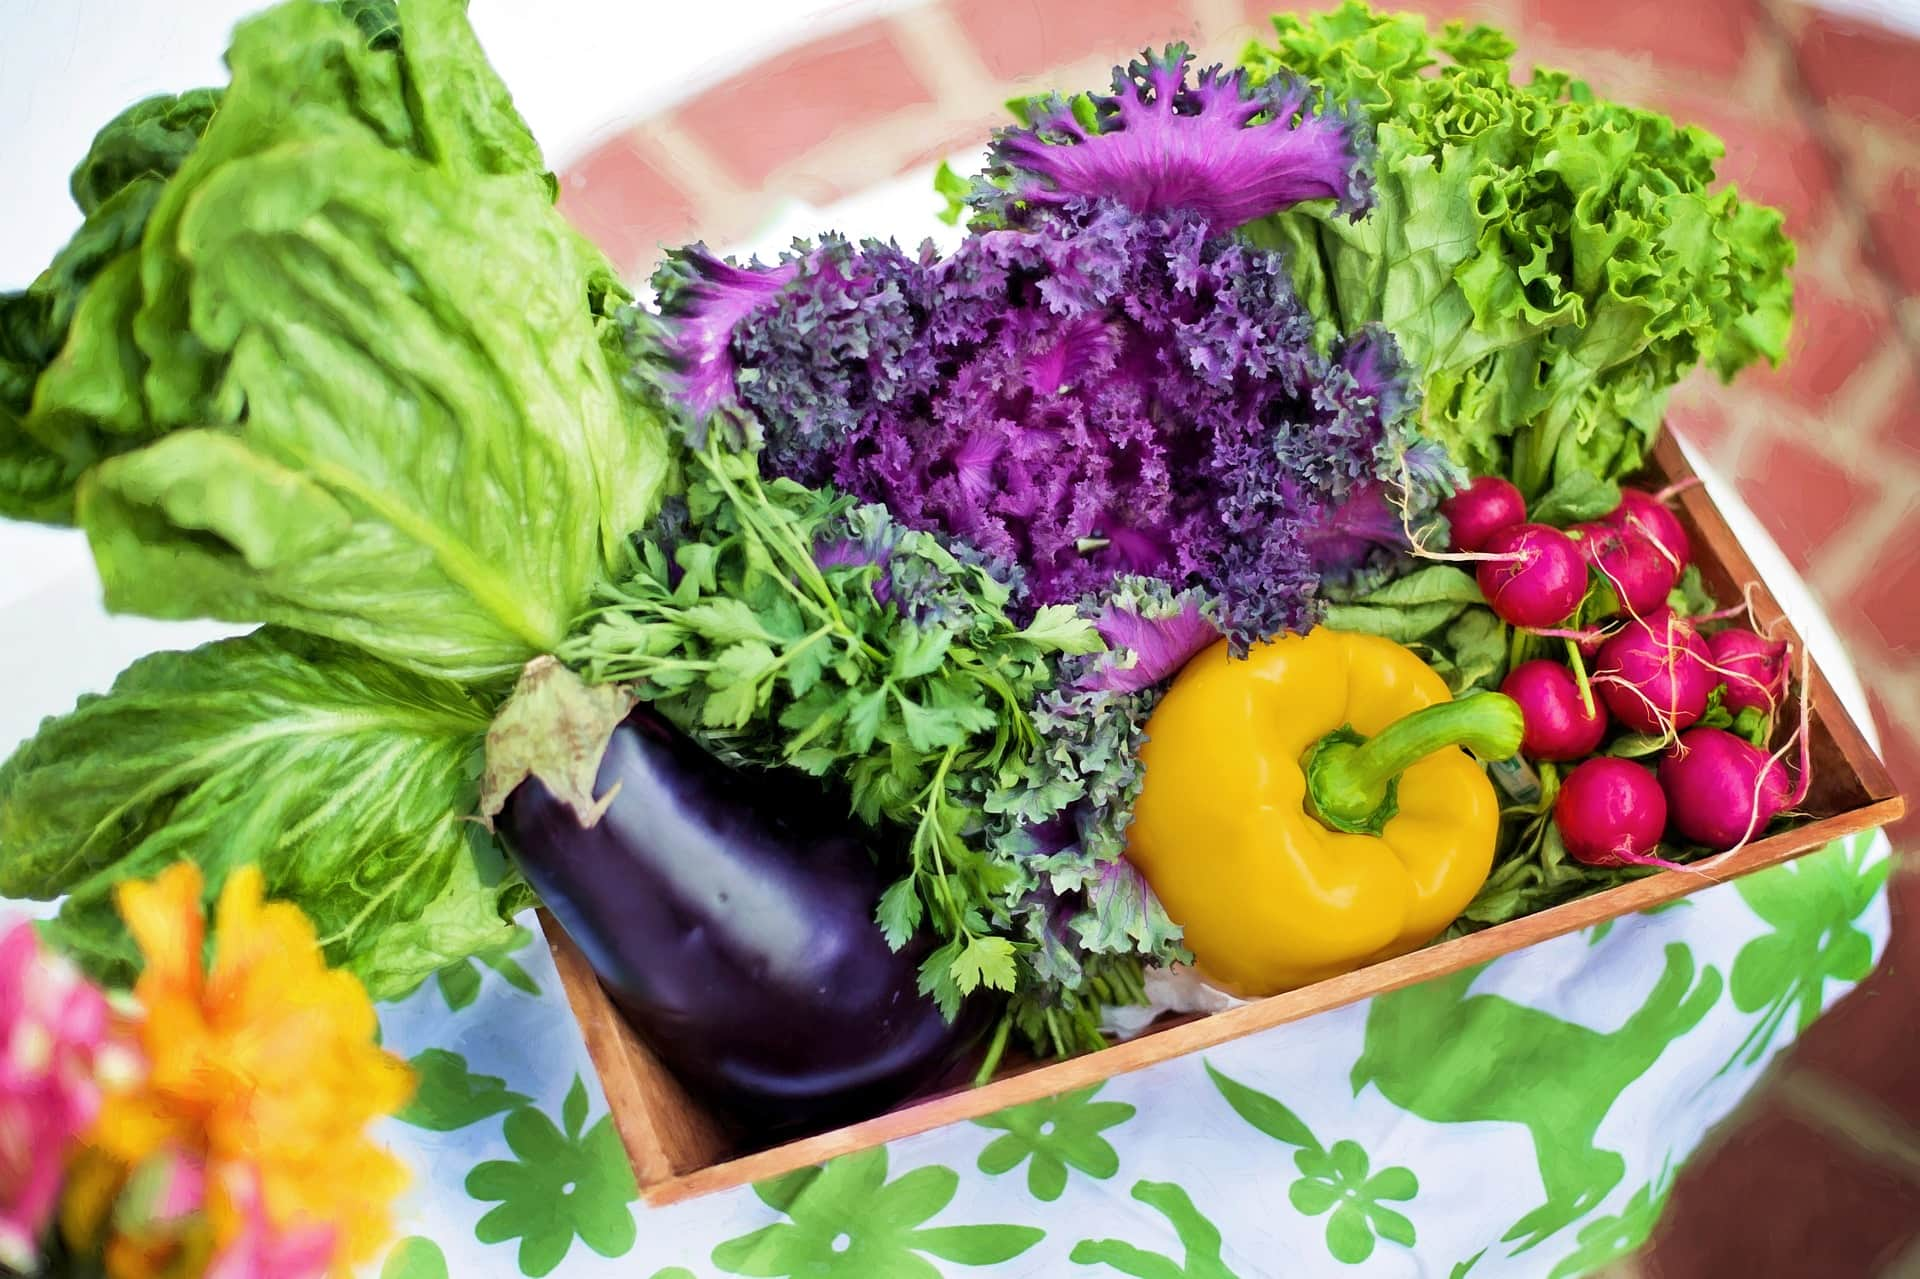 7 Ways to Save Money on Produce